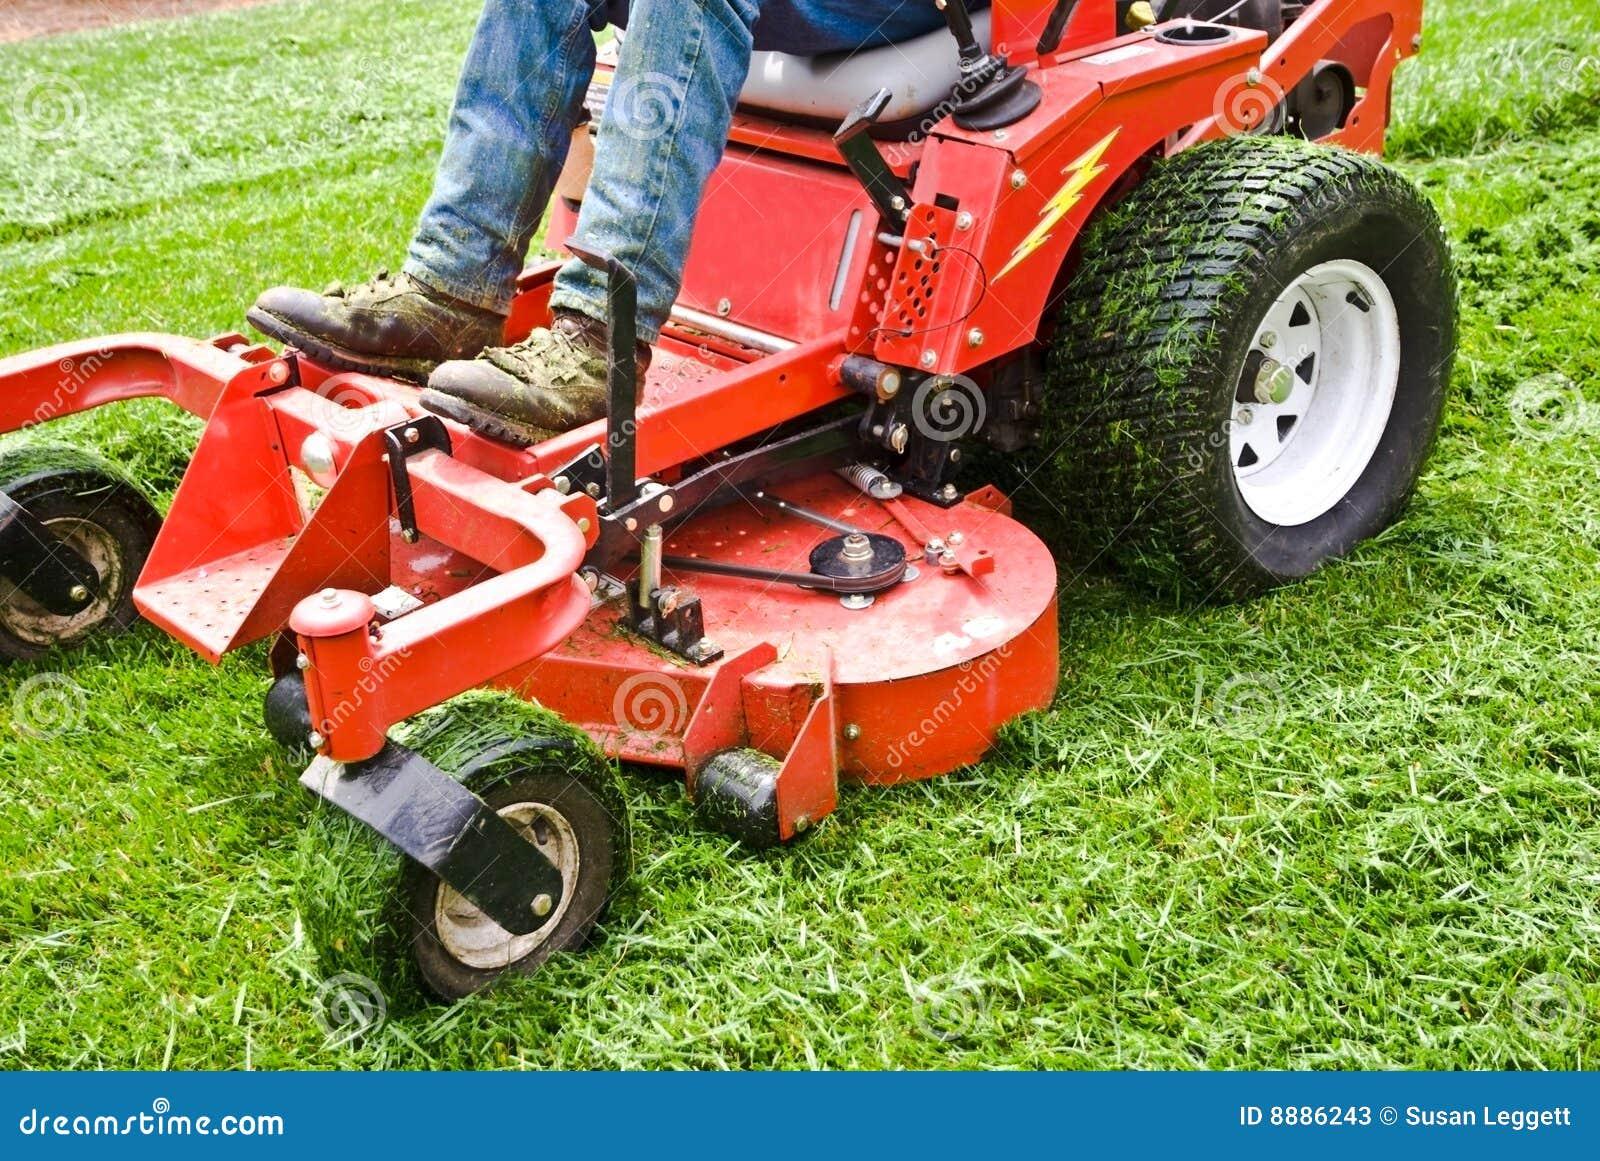 Lawn Care Equipment Clip Art Man on a riding lawn mower